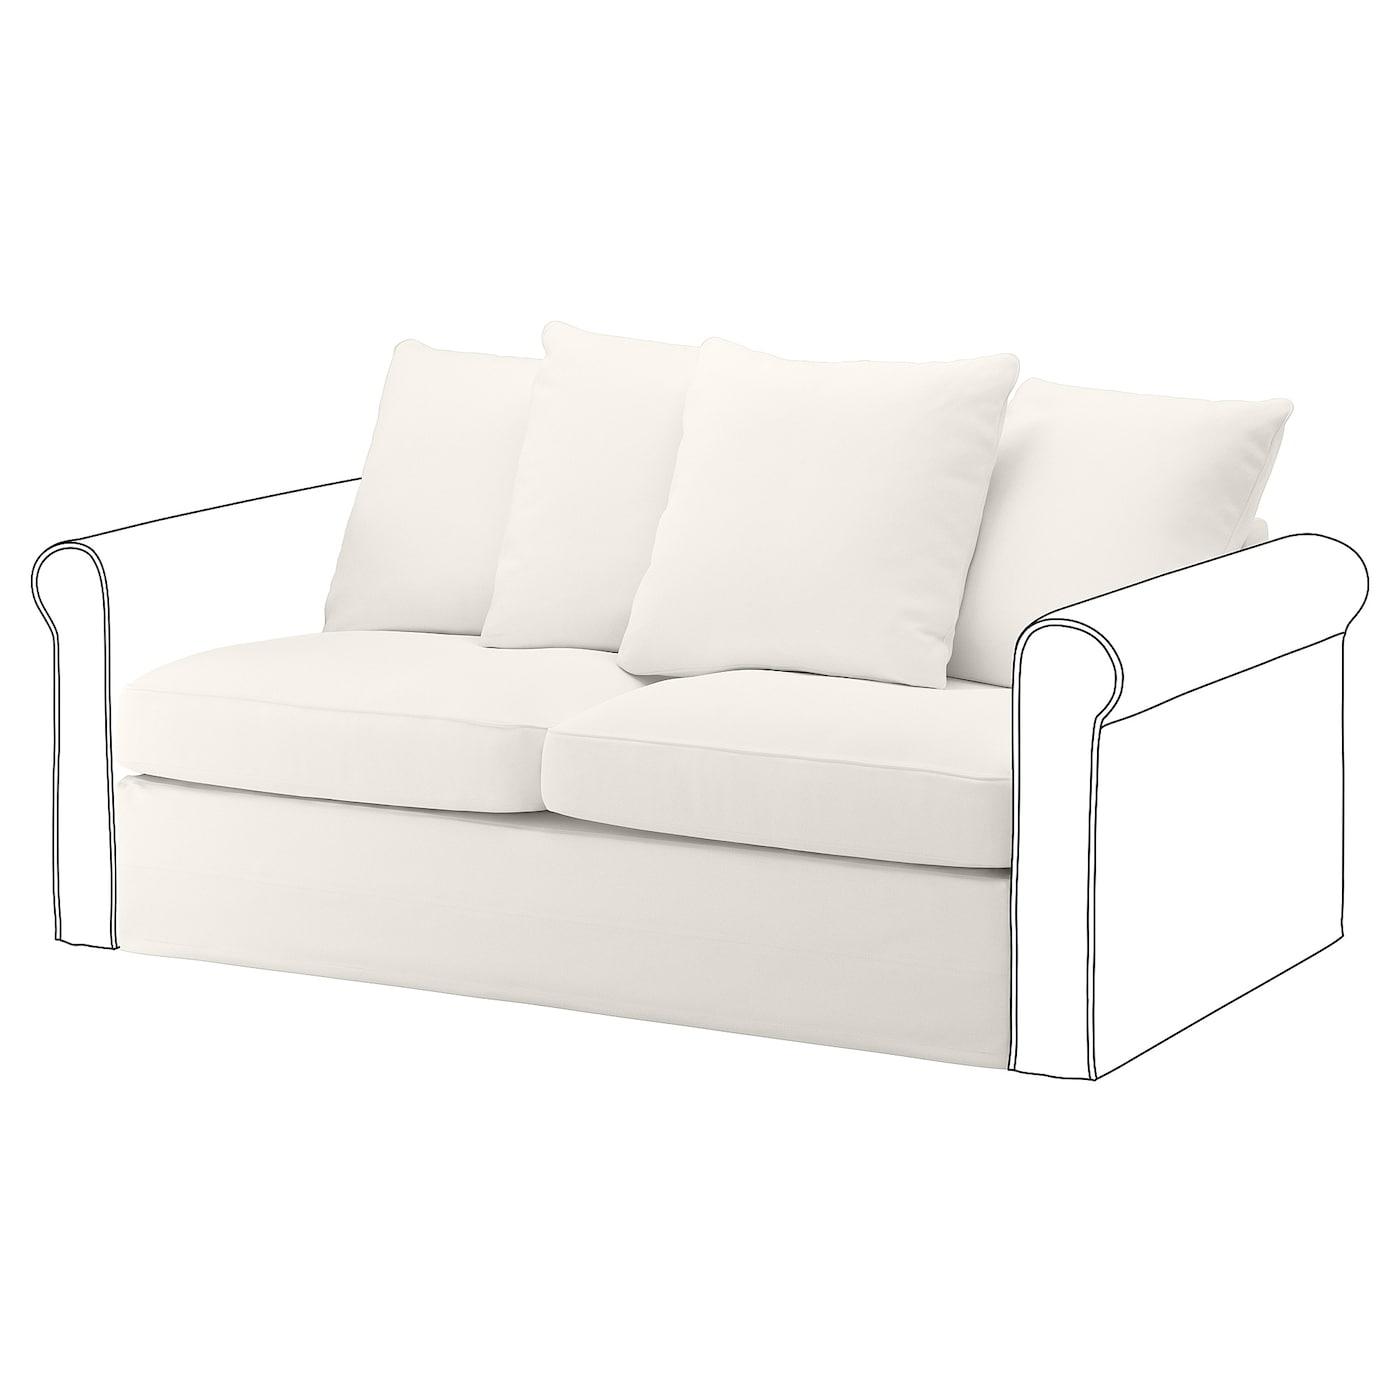 - GRÖNLID Loveseat Sleeper Section, Inseros White - IKEA